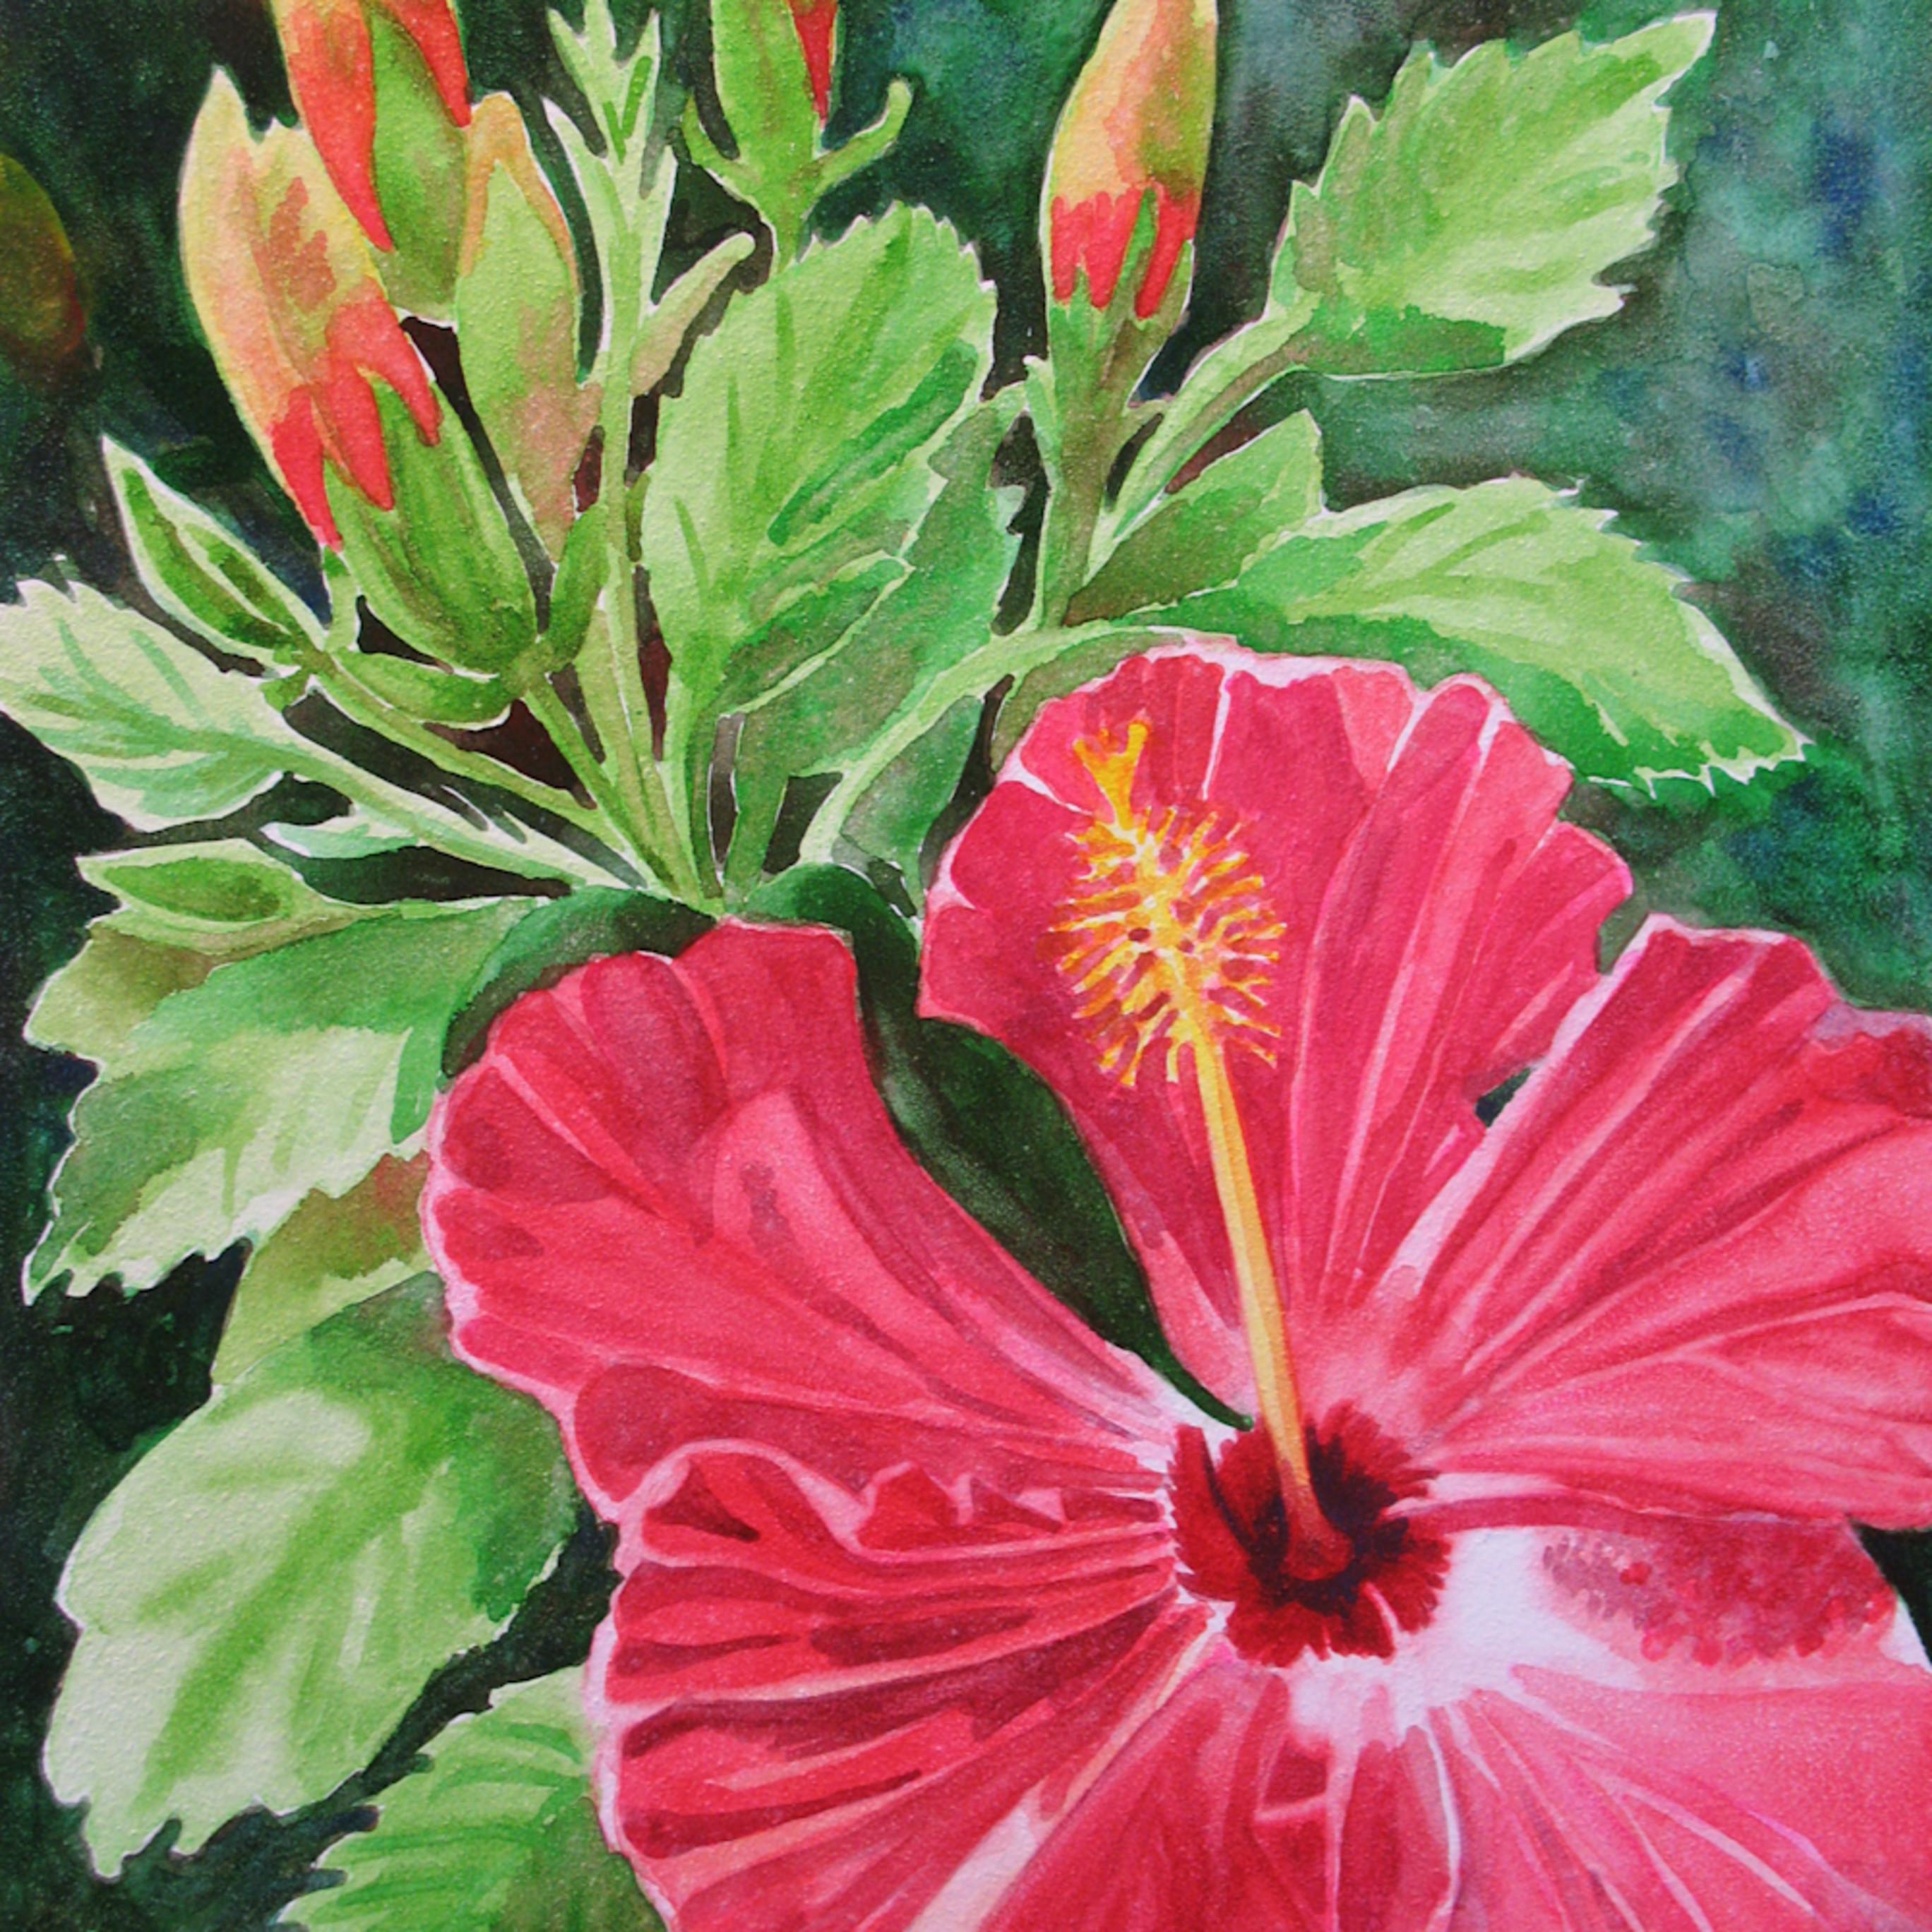 Hibiscus 1 rxqytv